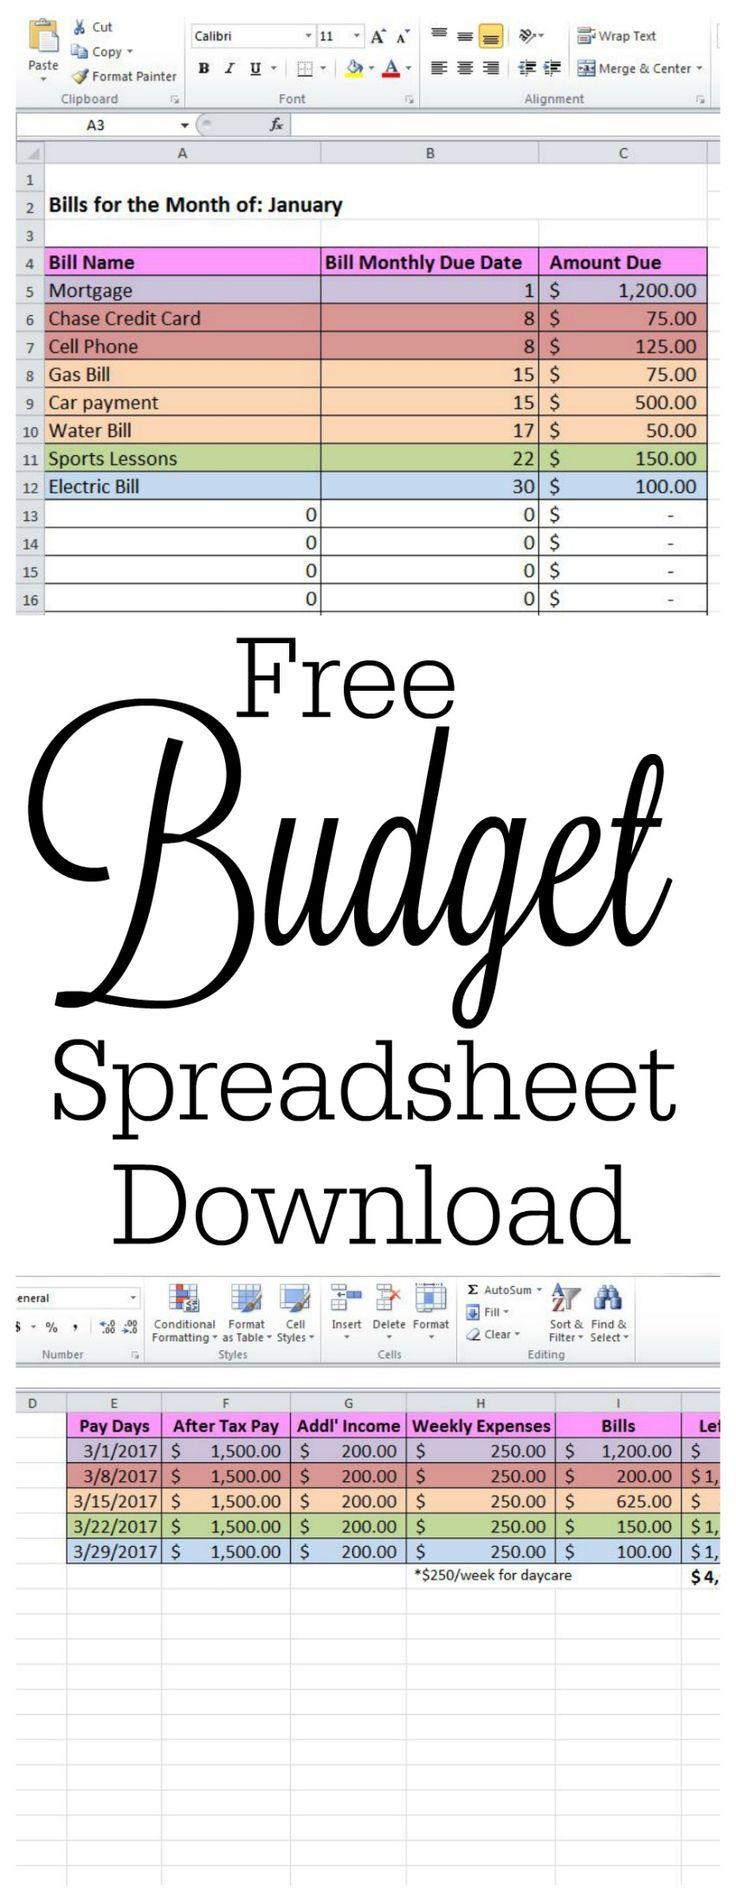 Free Spreadsheet For Windows 8